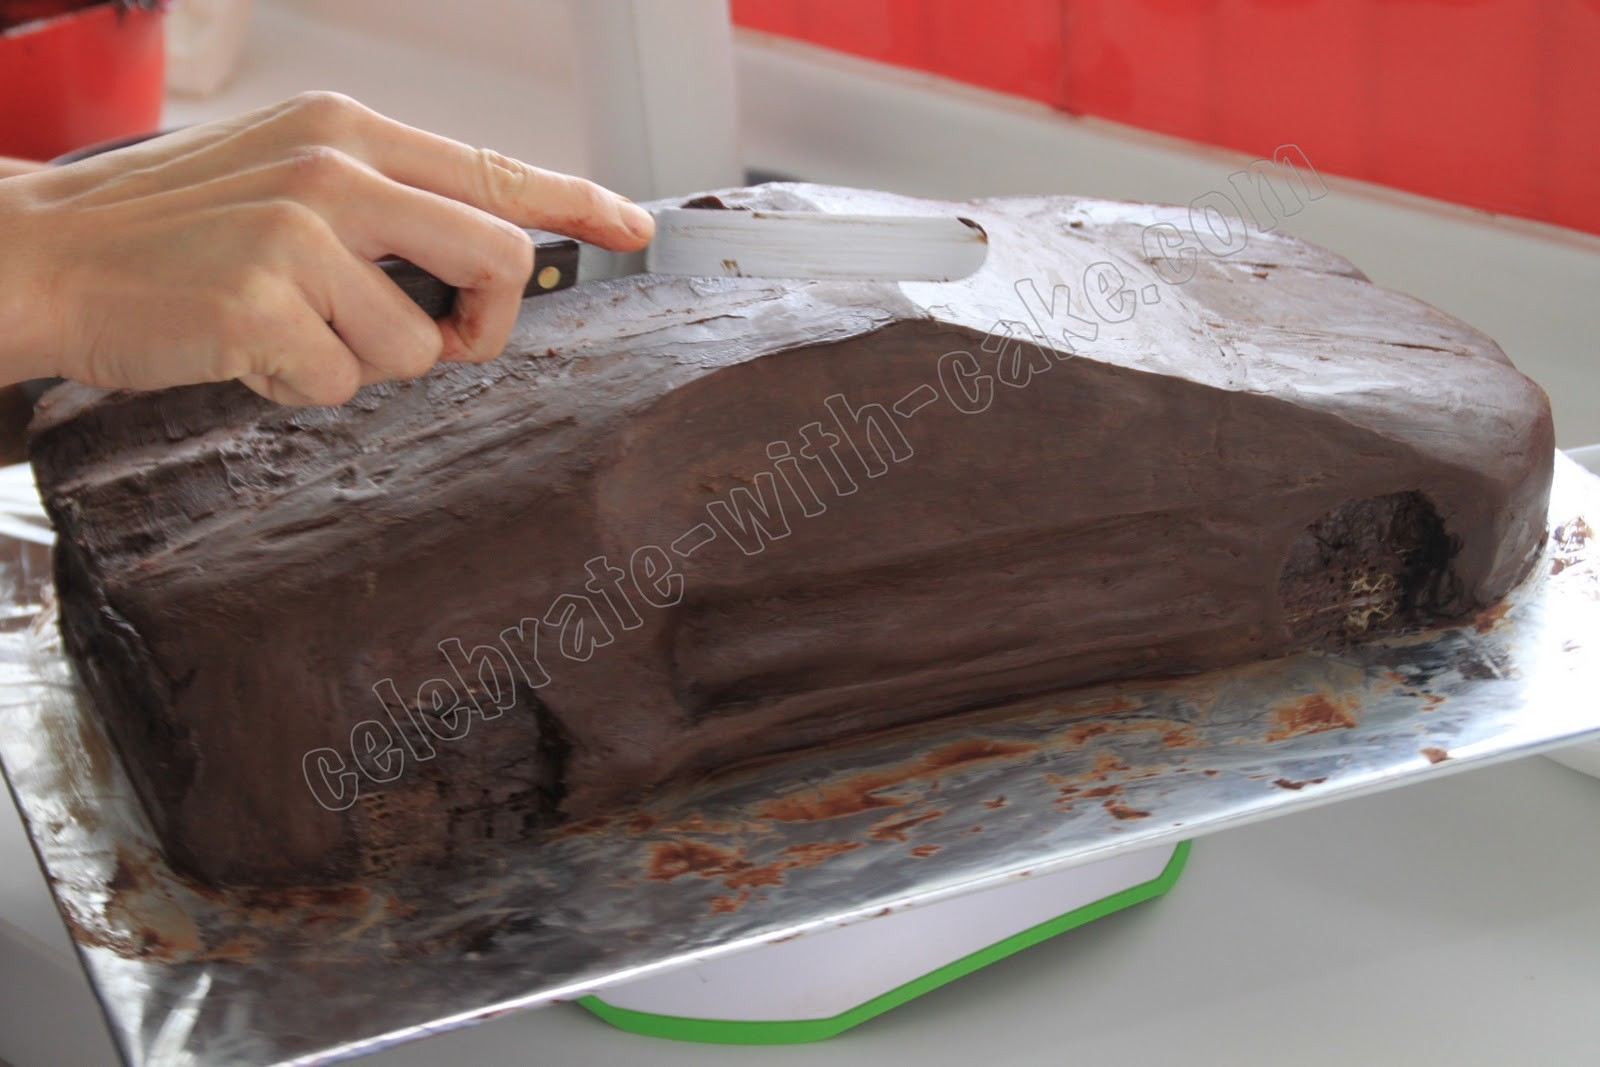 Celebrate with cake sculpted lamborghini aventador cake cake celebrate with cake sculpted lamborghini aventador cake cake decorating ideas pinterest lamborghini aventador lamborghini and cake baditri Gallery